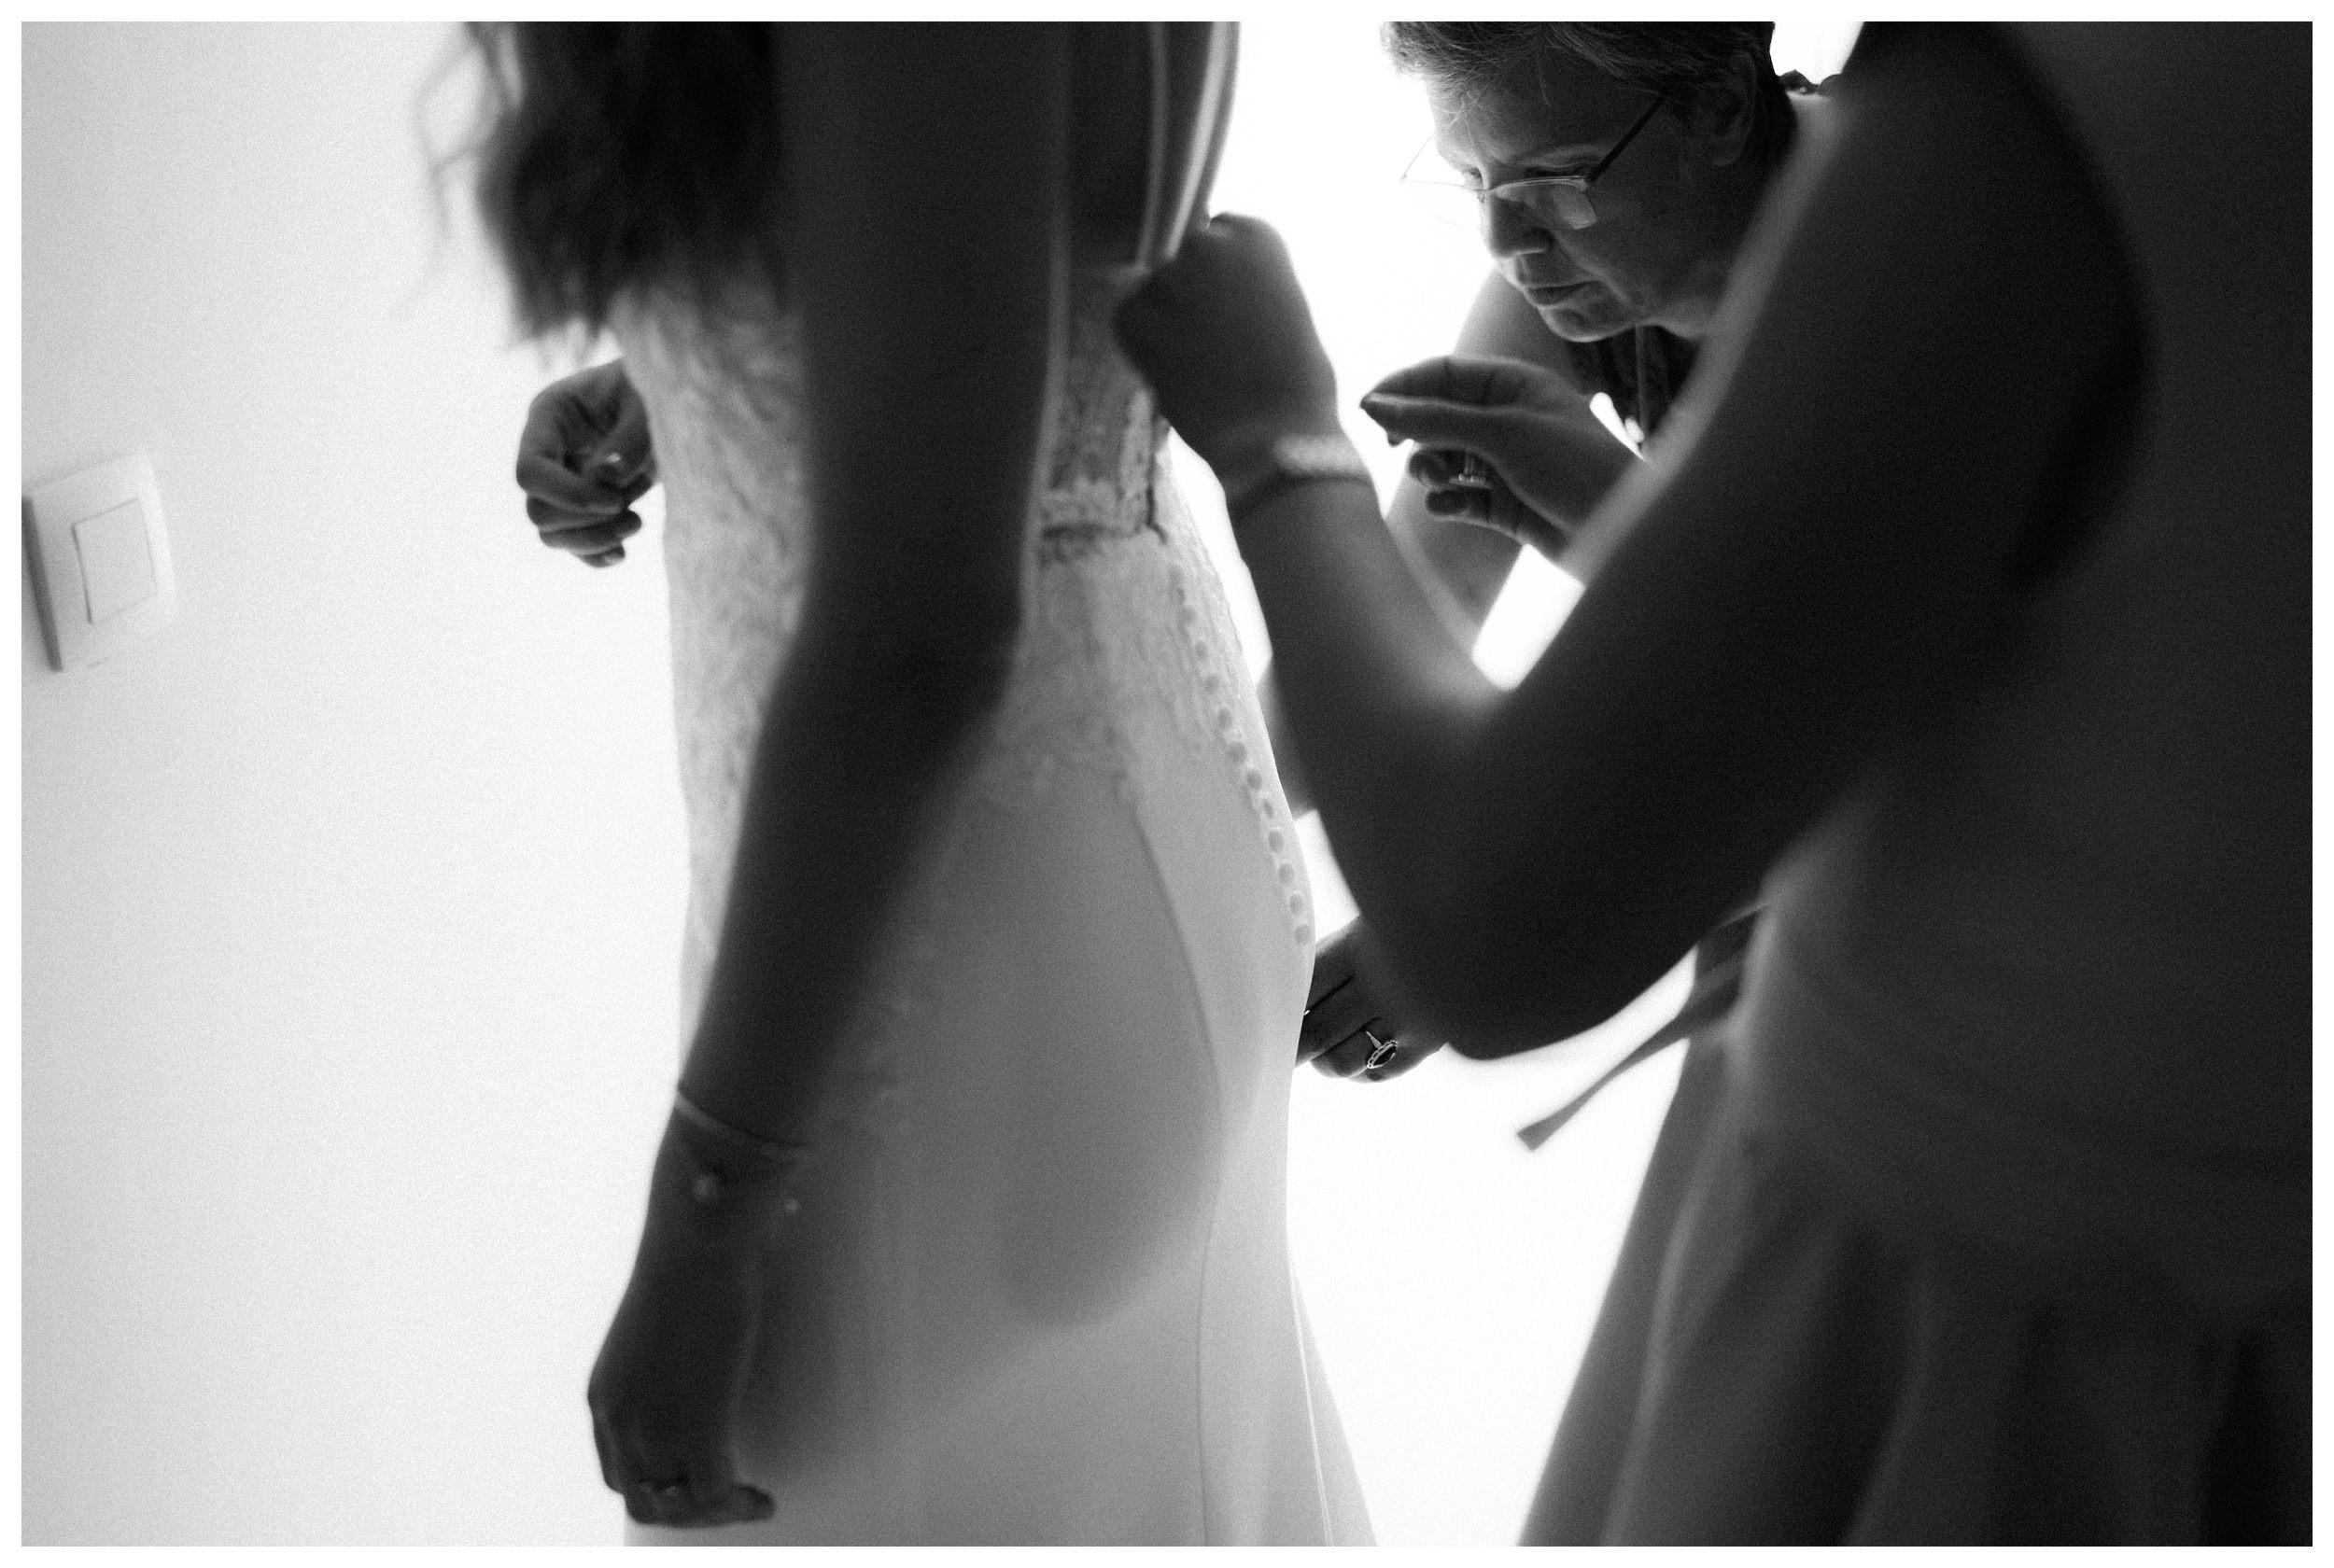 huwelijksfotograaf bruidsfotograaf destinationwedding huwelijksfotografie in ardennen nederland (18).jpg